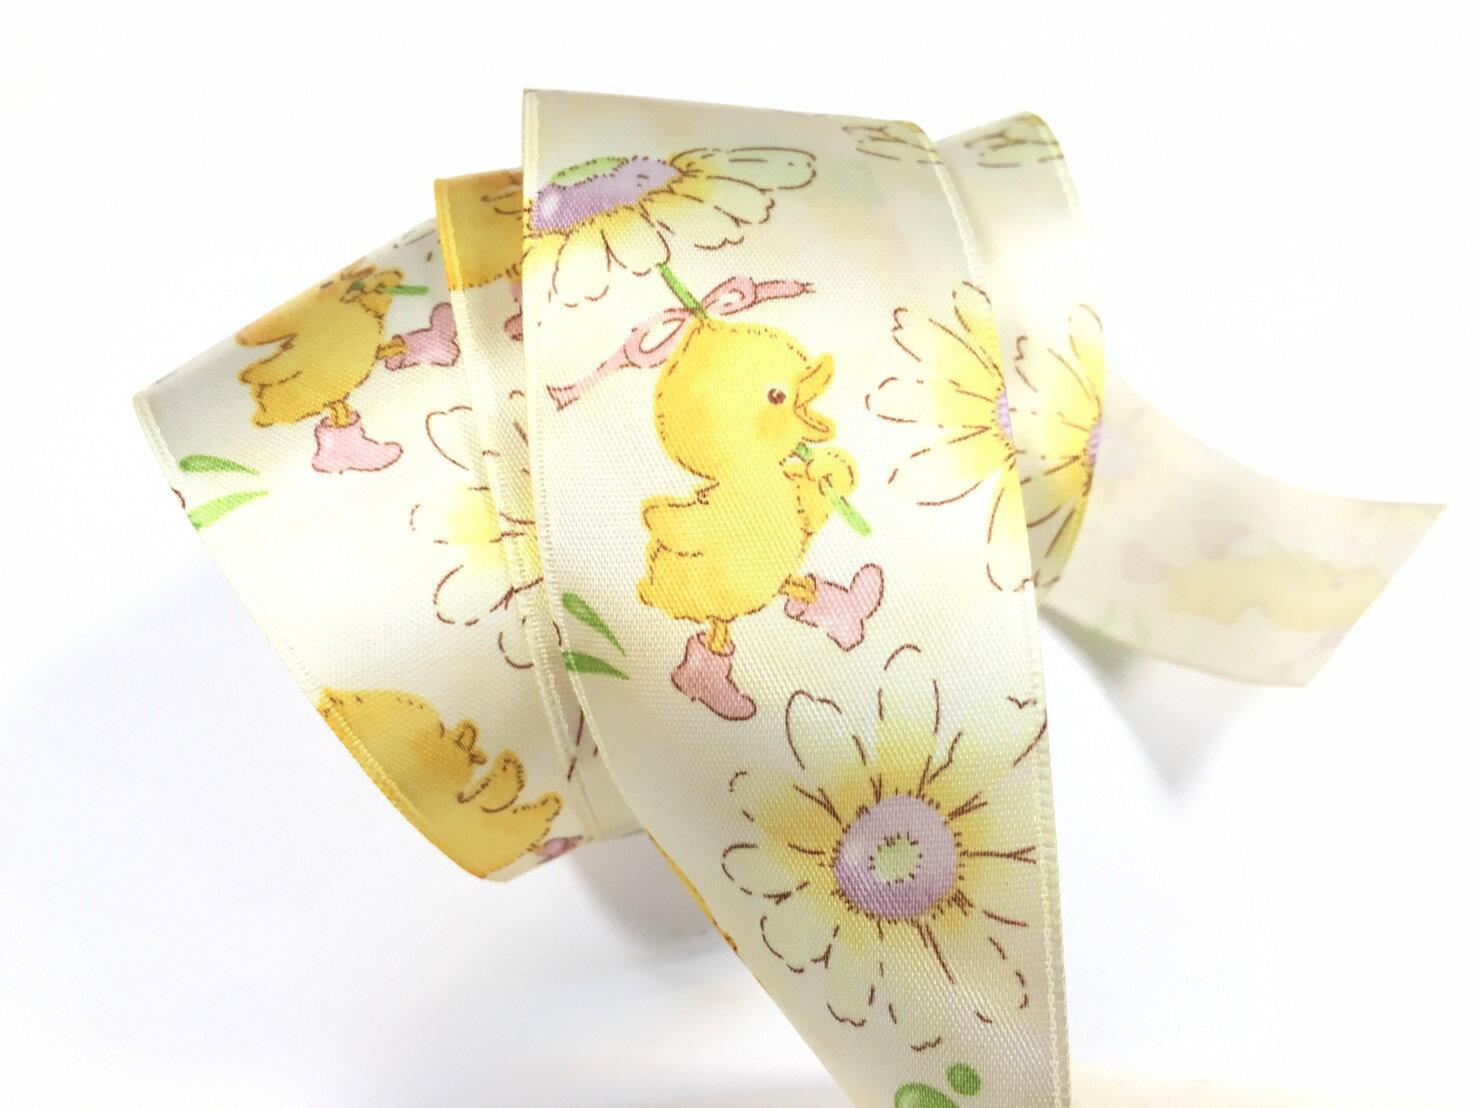 【Crystal Rose緞帶專賣店】黃色小雞單面緞緞帶 38mm 3碼 (4色) 1